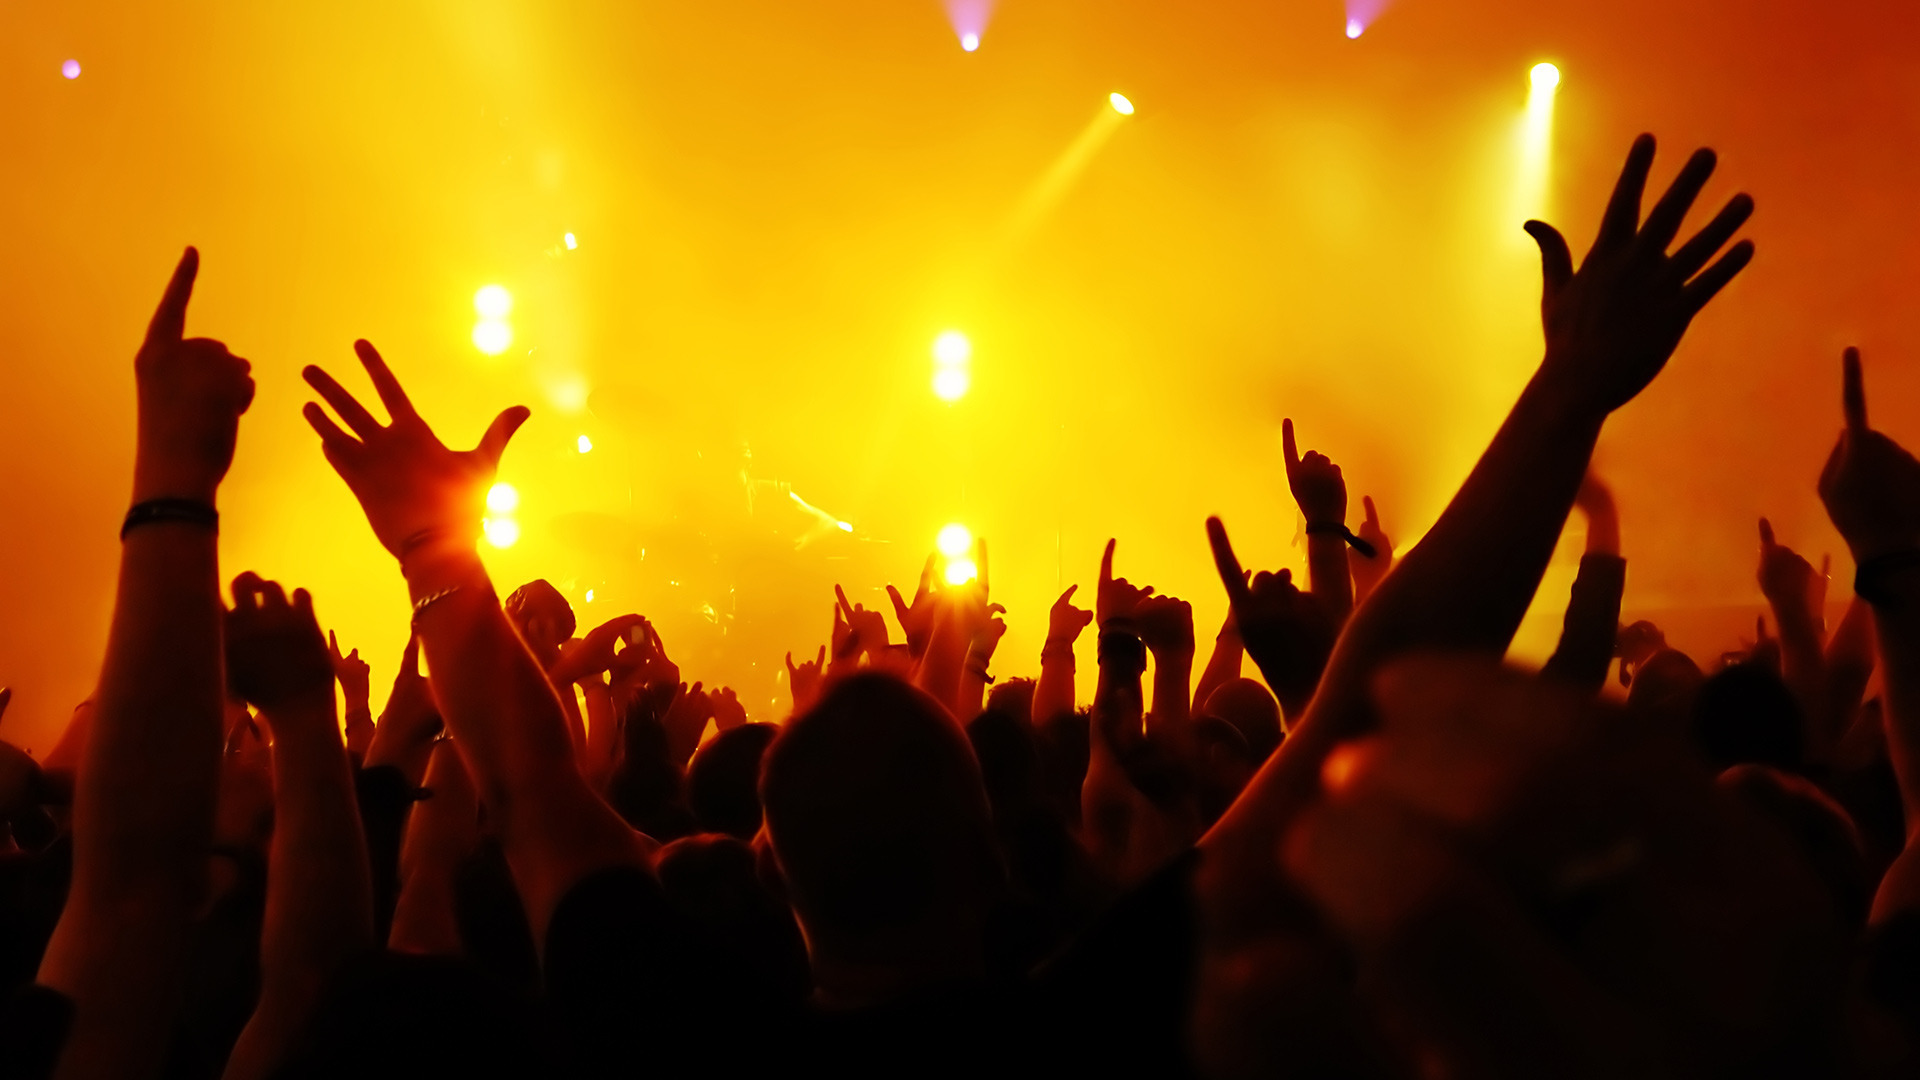 style-dance-desktop-stage-lighting-crowd-audience-hand-emotions-theme-mood-273110.jpg